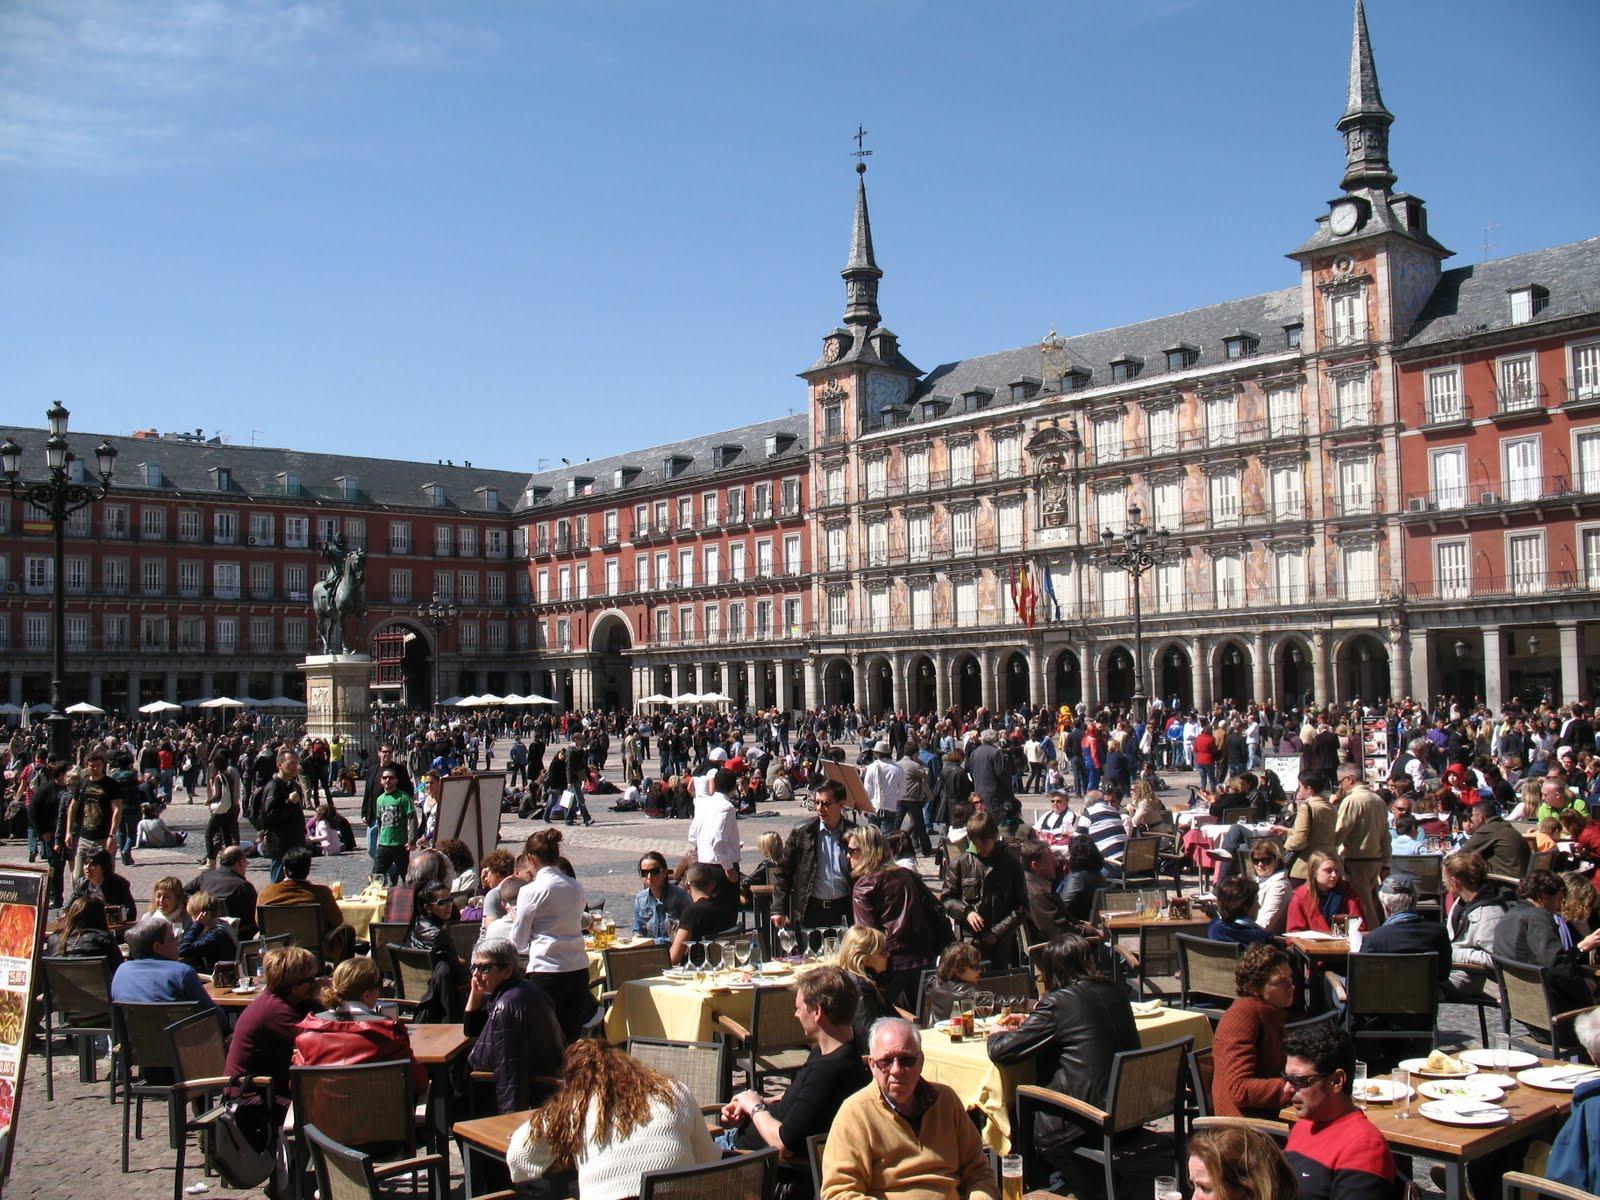 Plaza mayor de madrid arquitectura e historia for Discoteca plaza de los cubos madrid